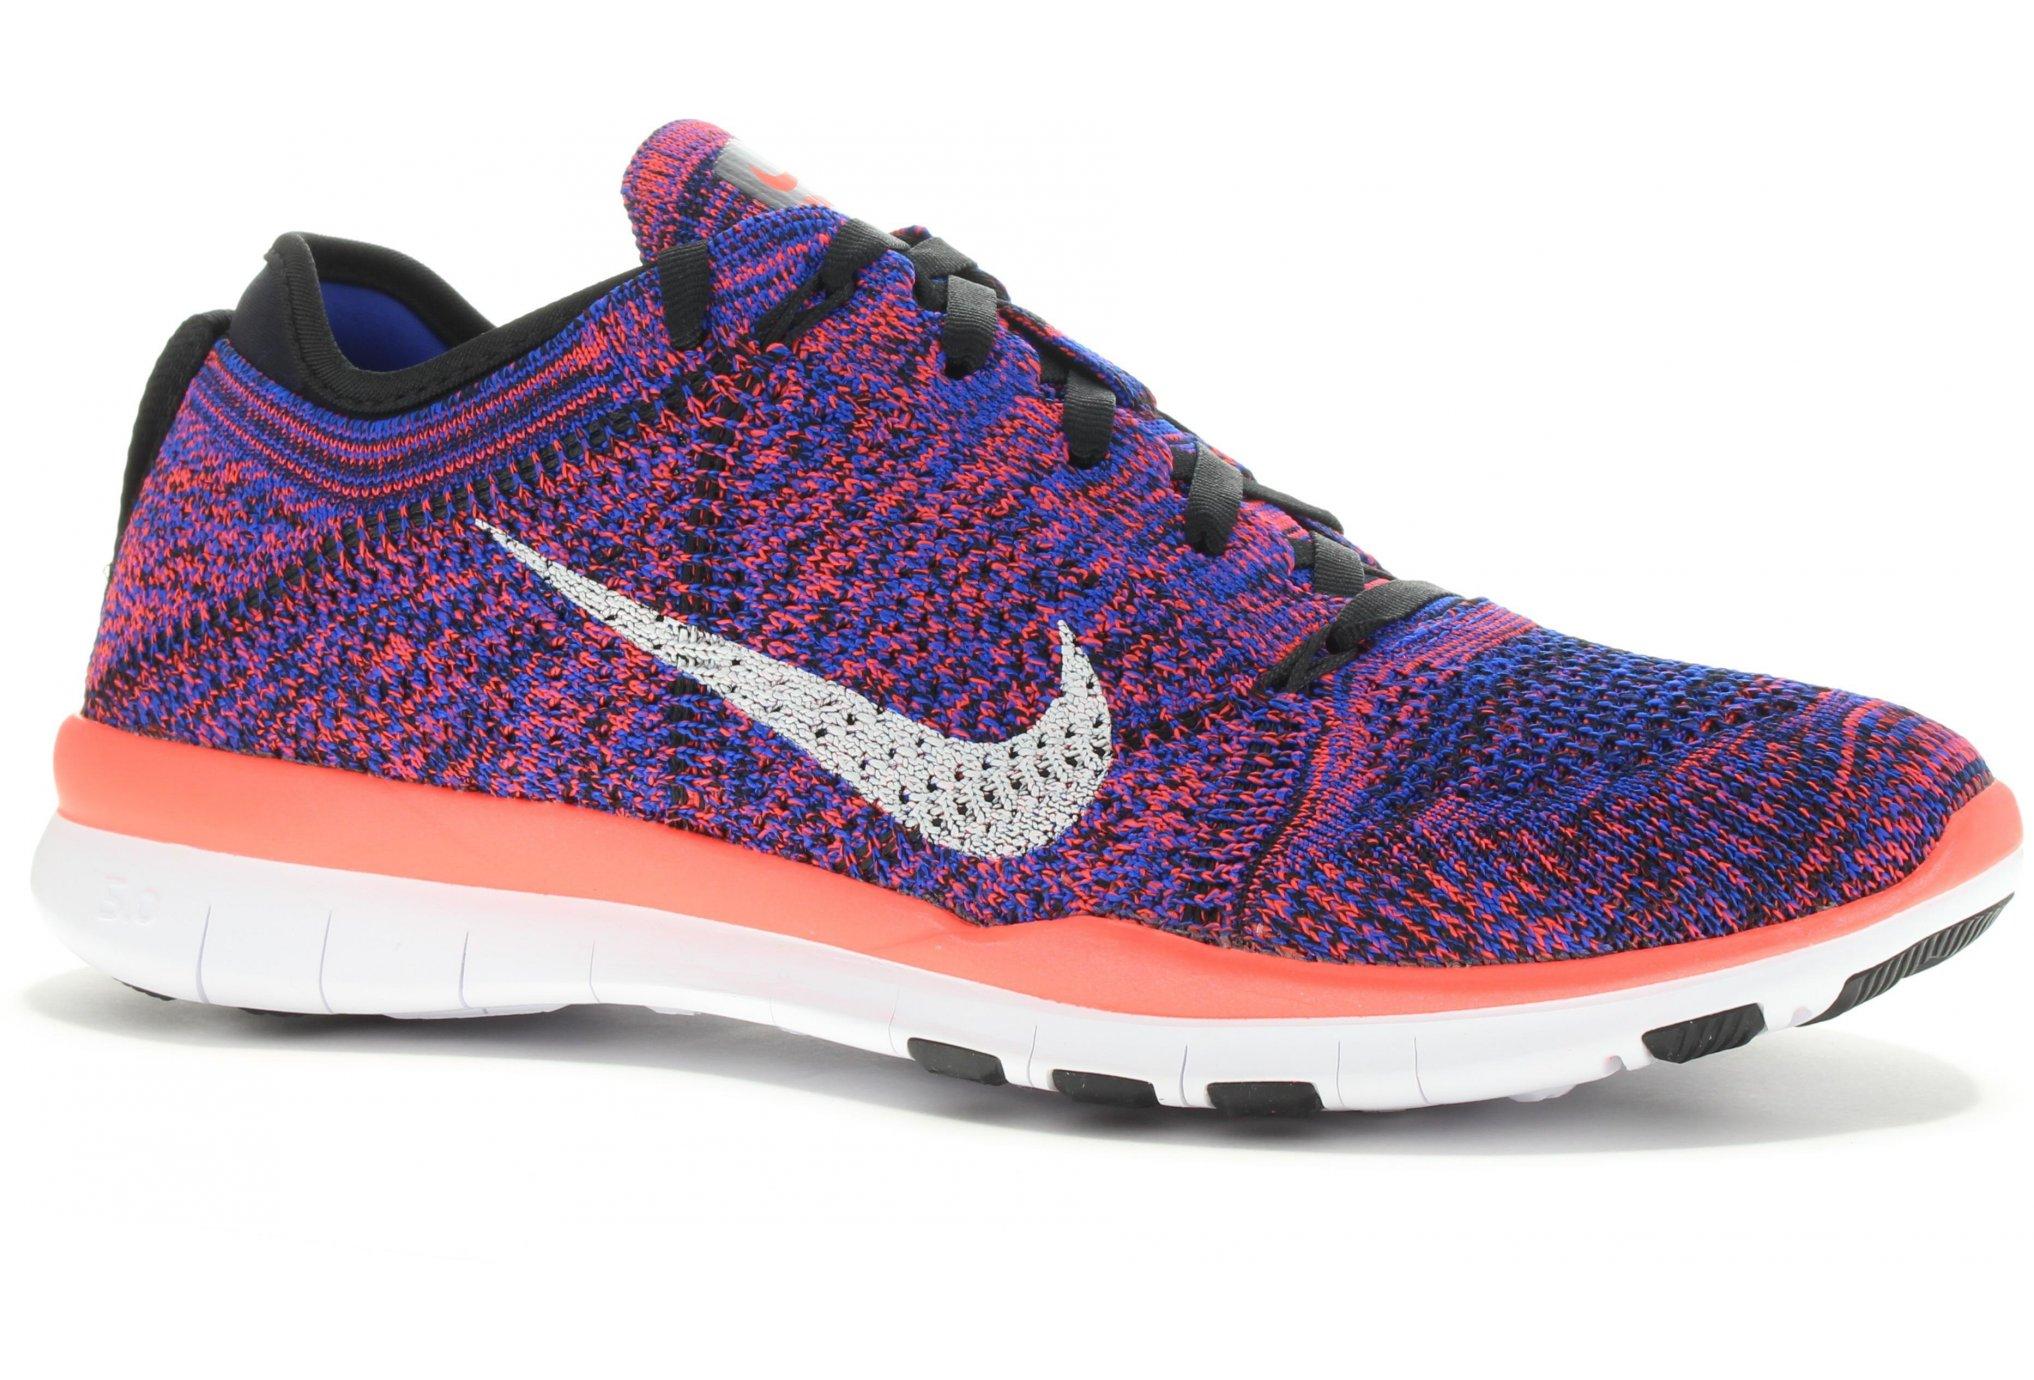 1a6c60d415 Nike Free 5.0 TR Flyknit W femme Rouge pas cher